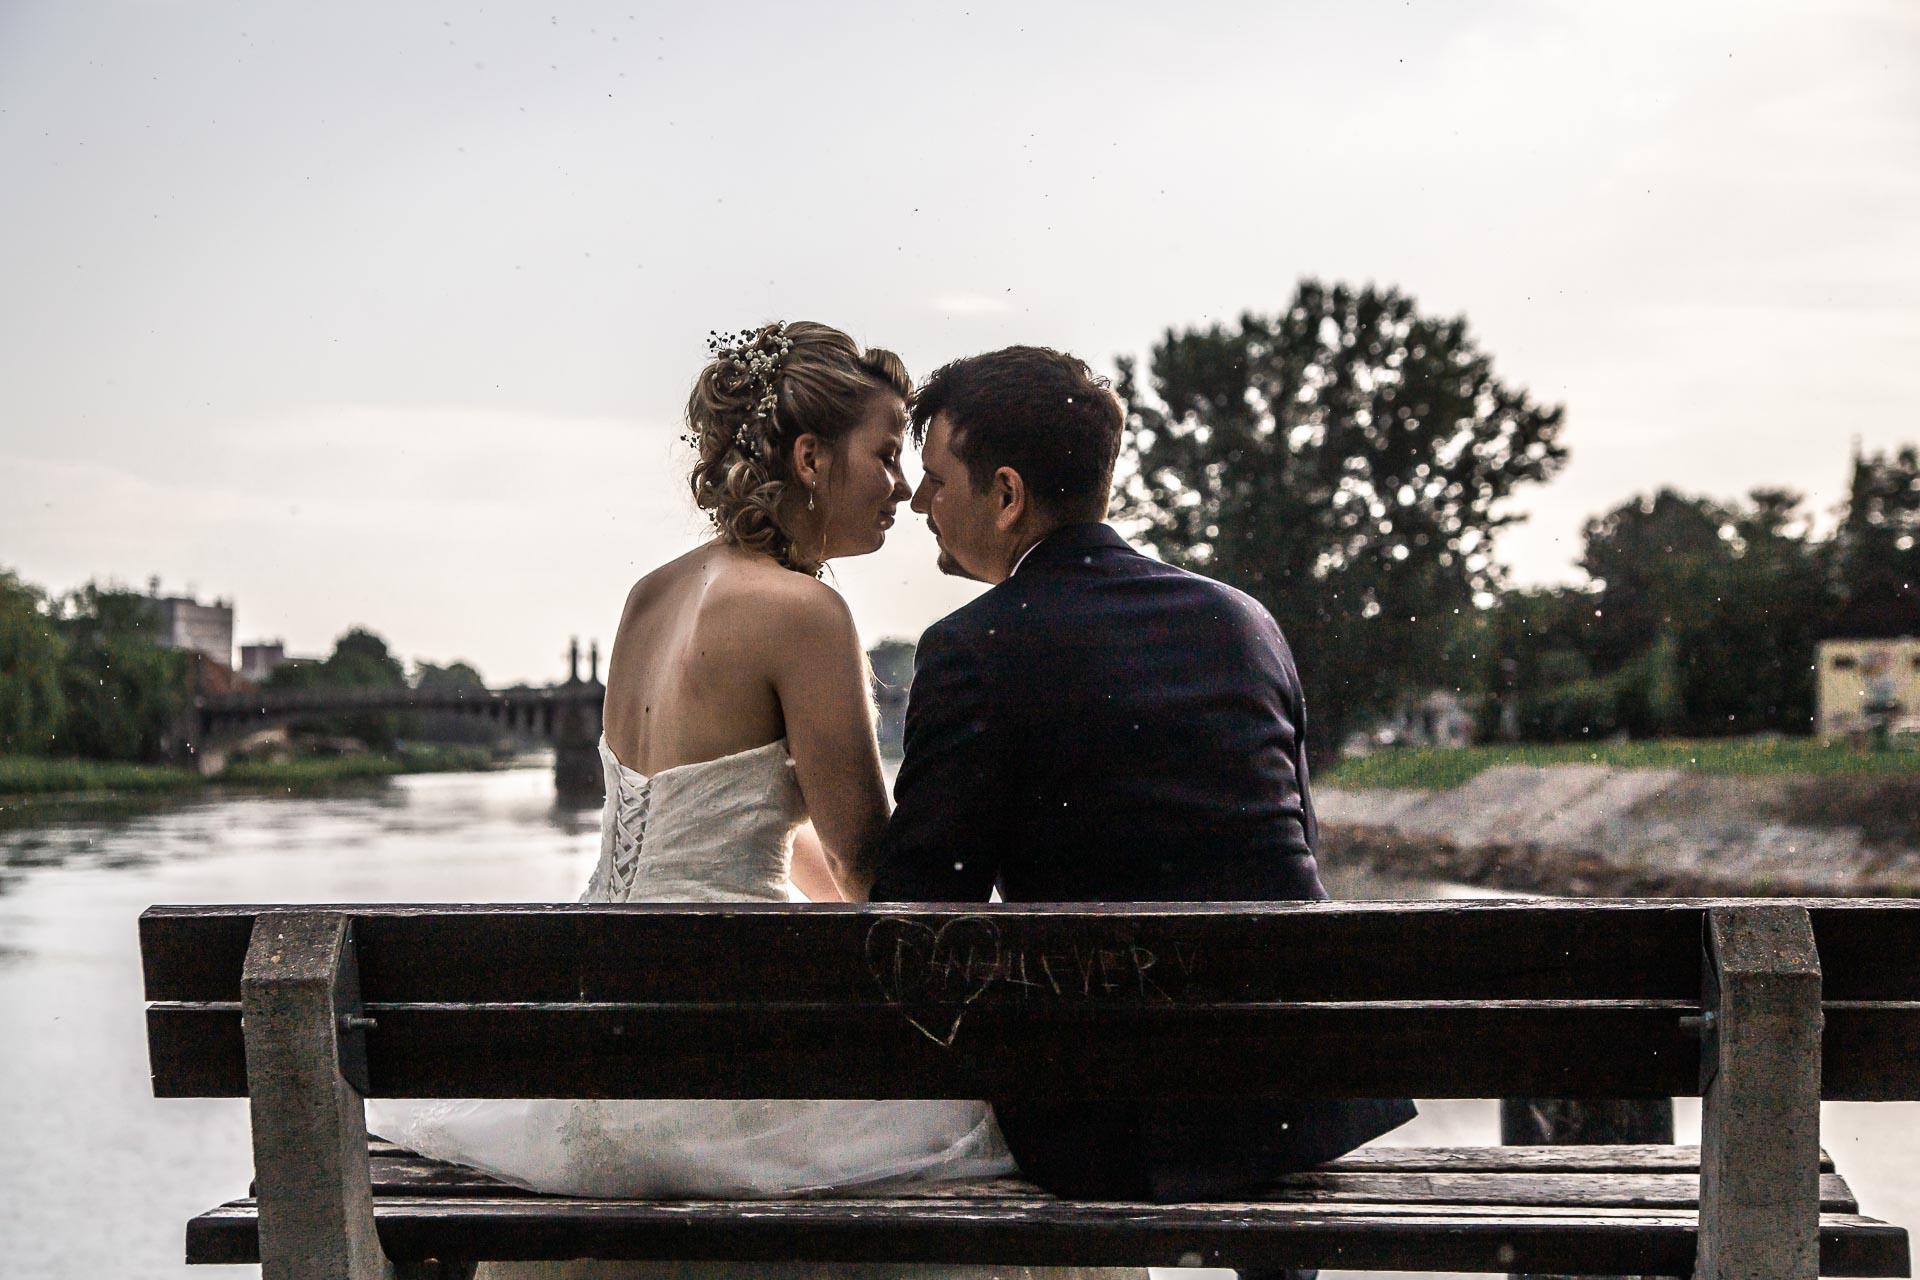 Svatební-fotograf-Nymburk-6182